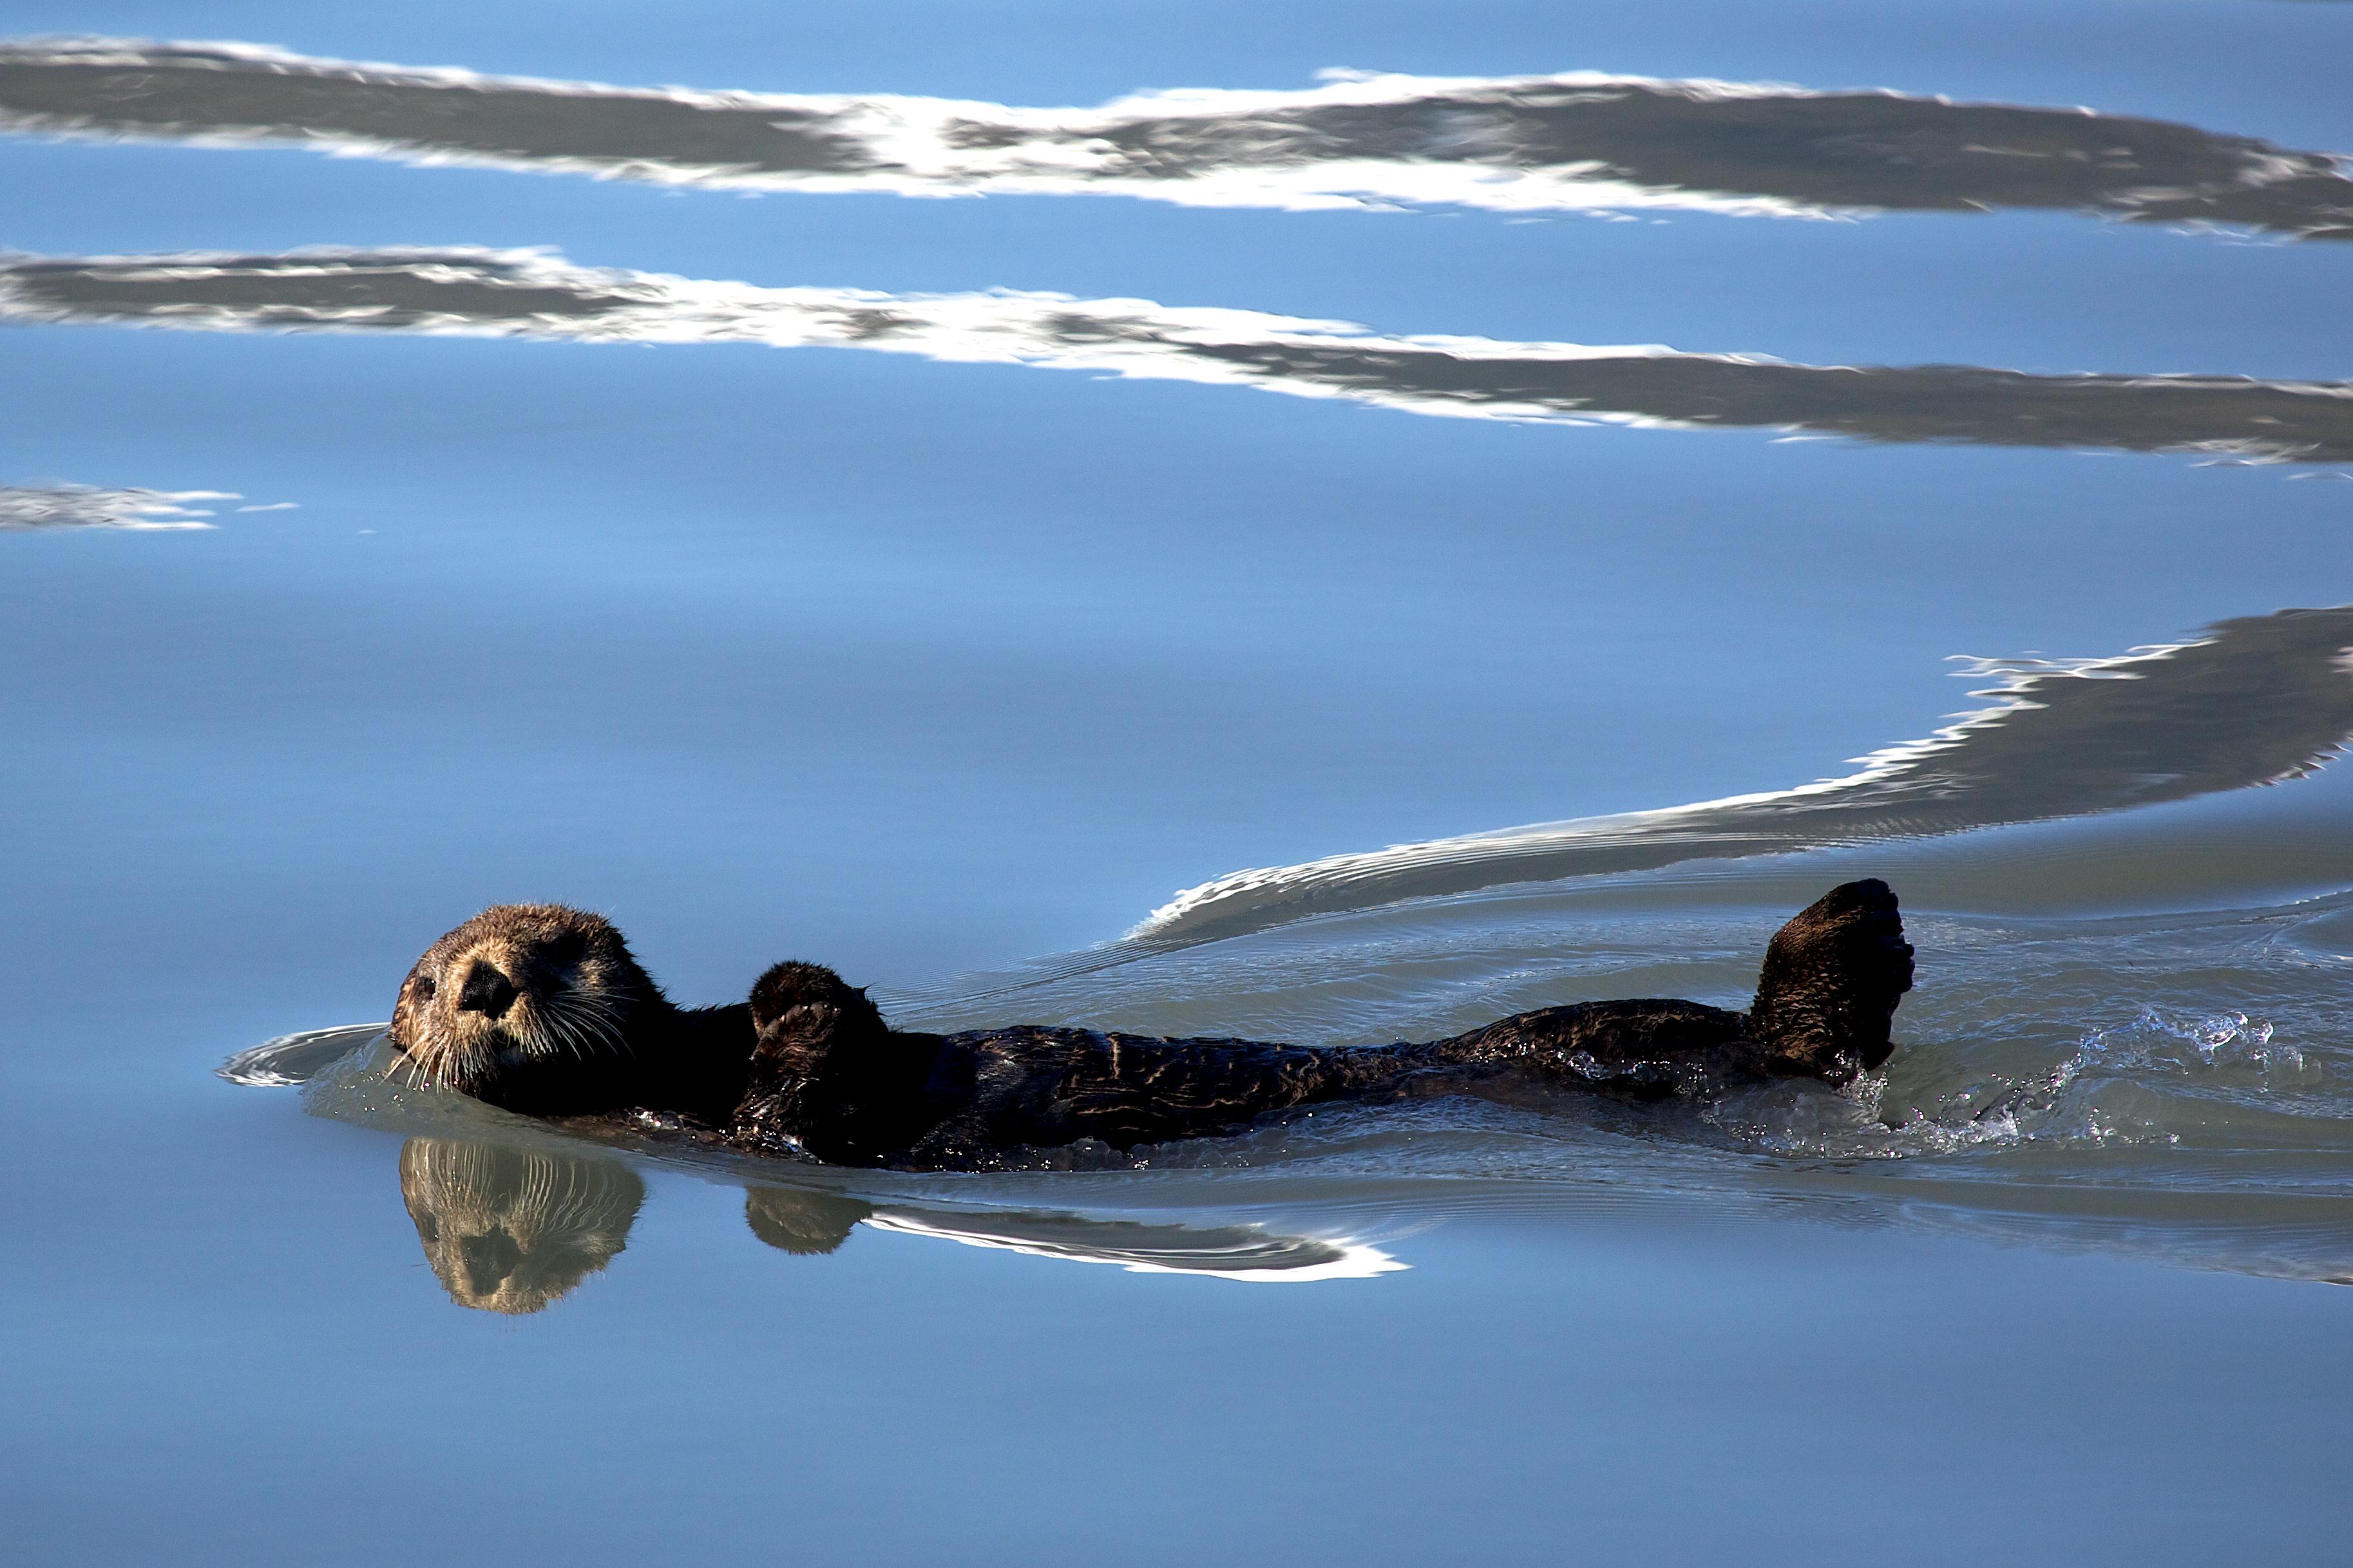 A sea otter floats at the Kenai Fjords National Park. (Public domain photo by Kaitlin Thoresen/National Park Service)